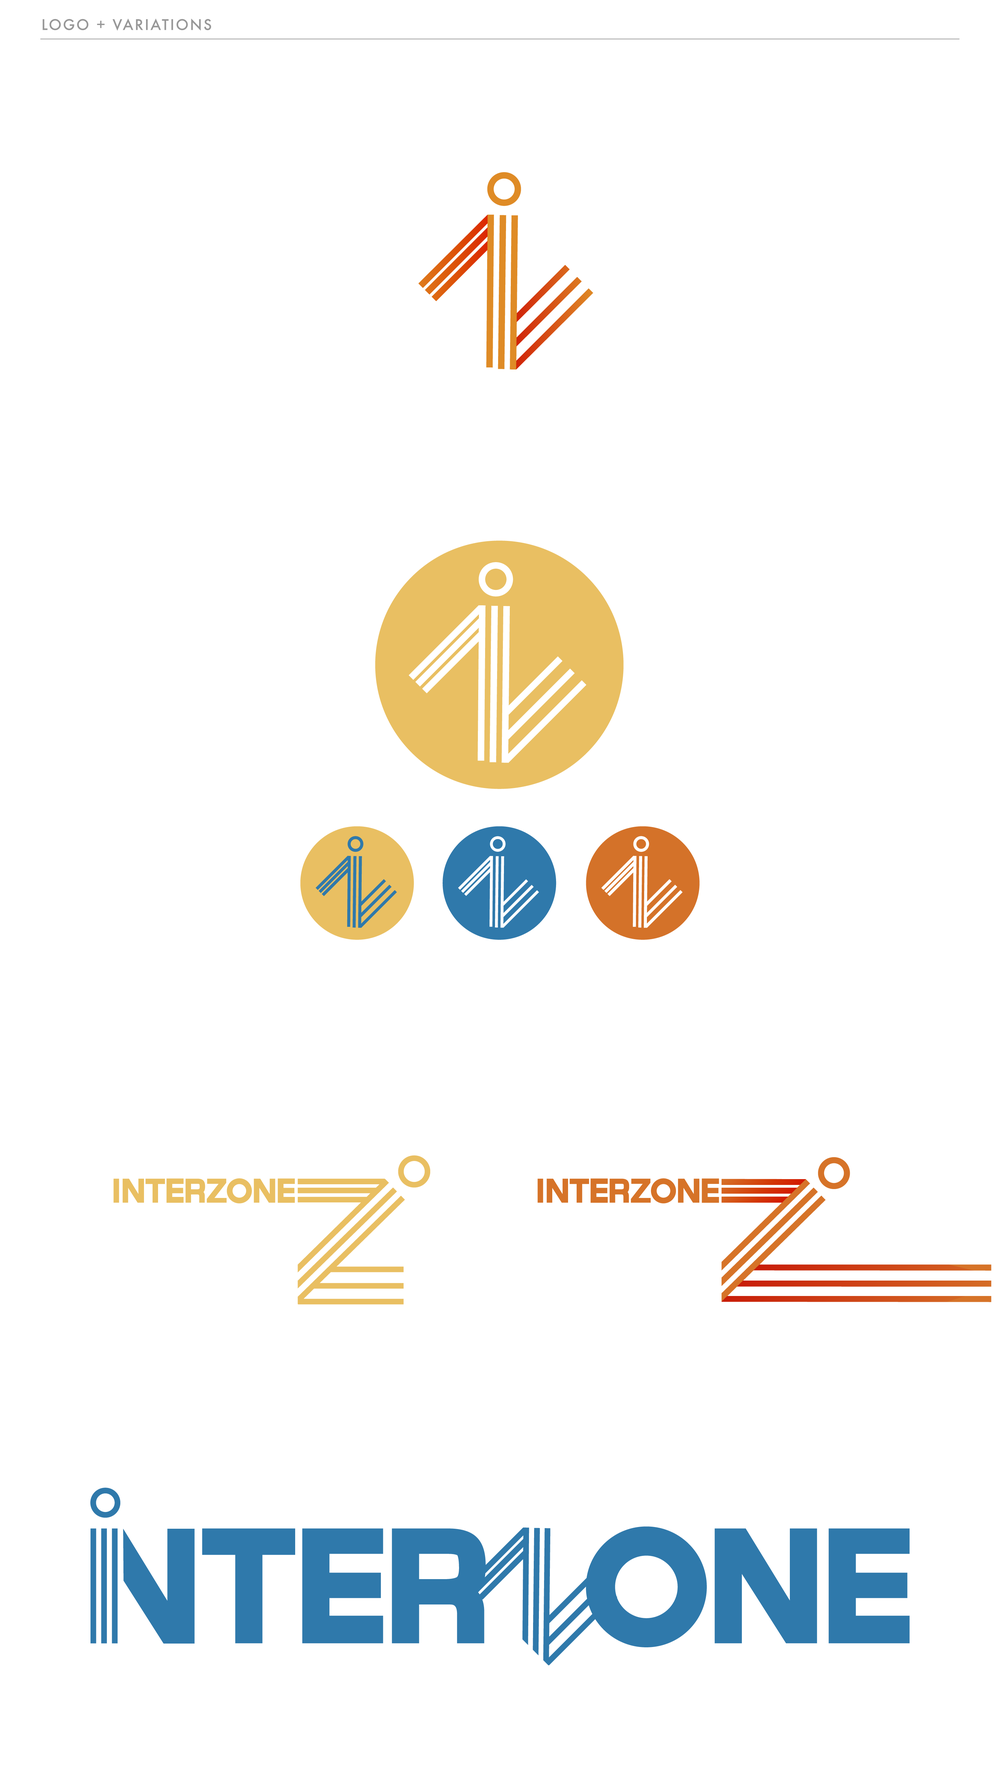 logo-variations-01.png